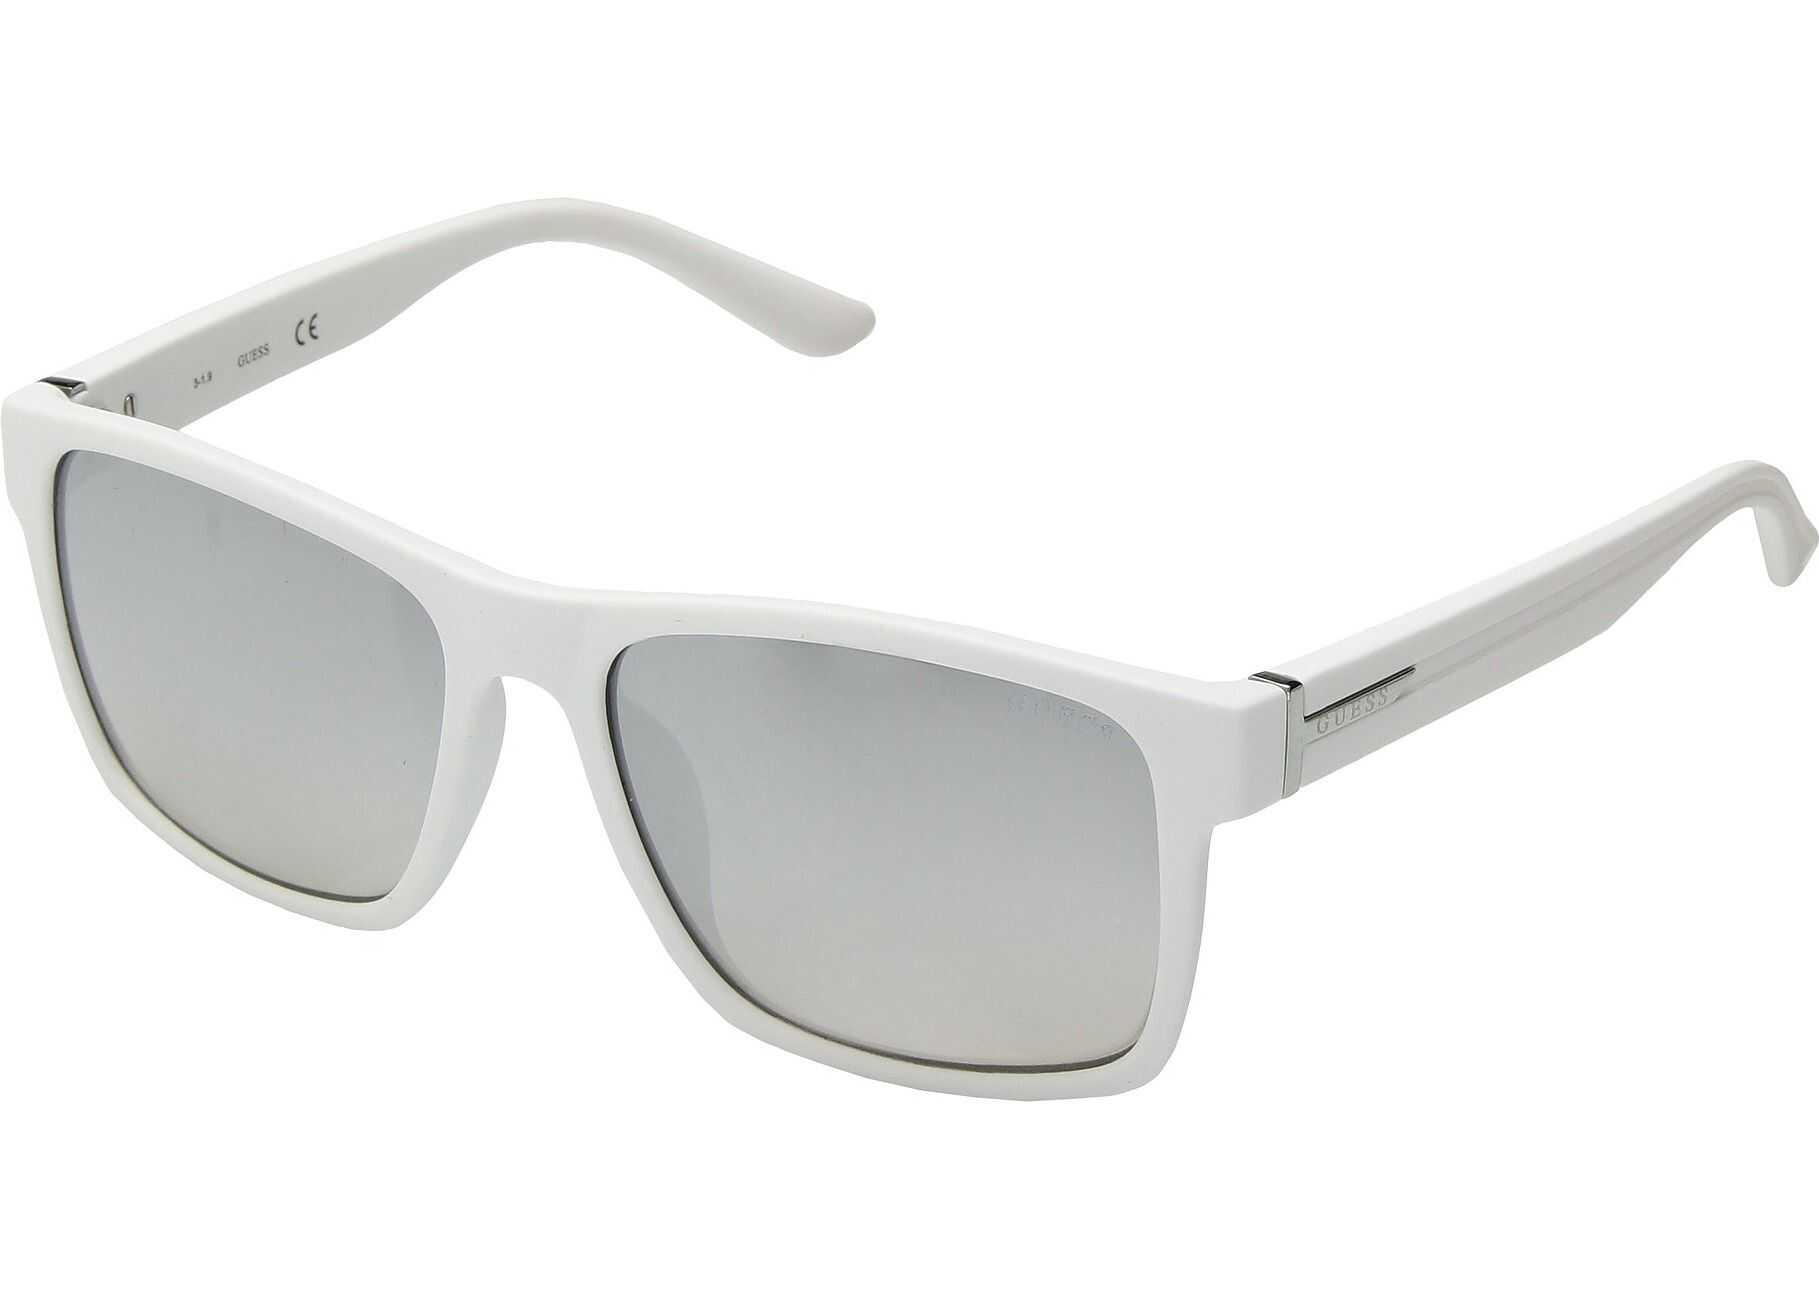 GUESS GF5049 White/Gradient Blue